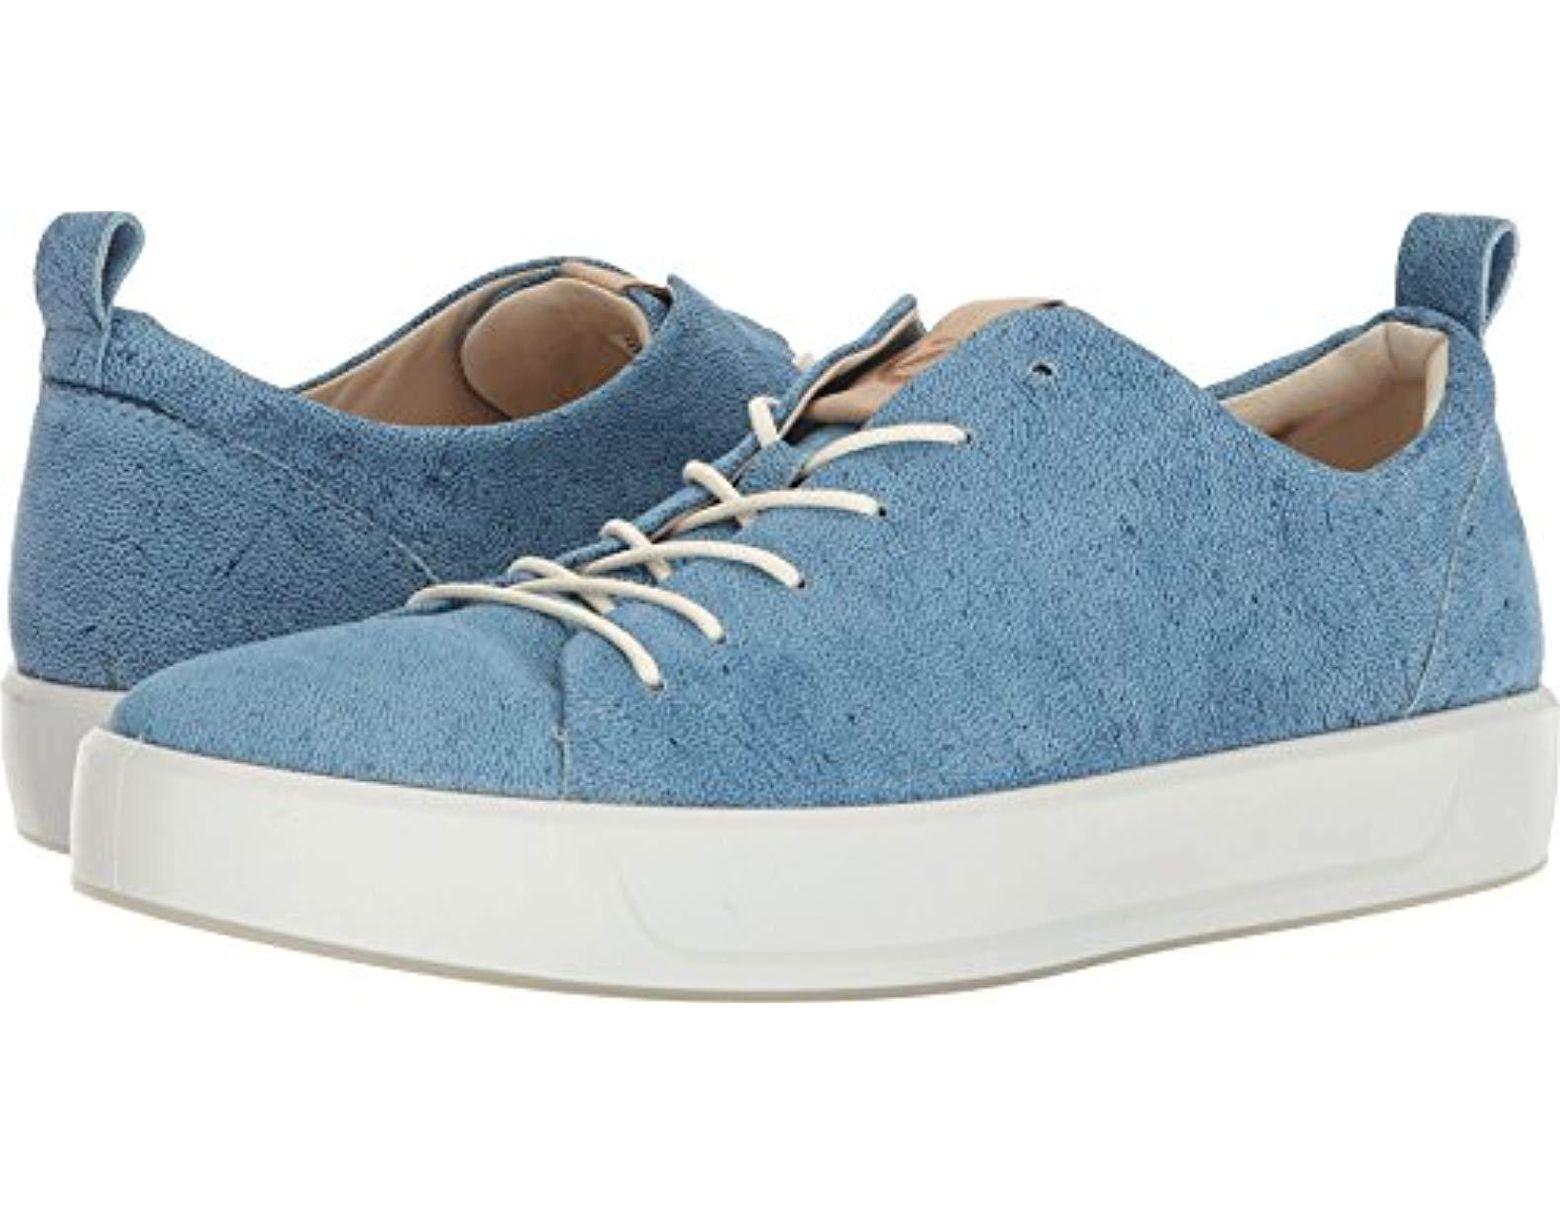 99f6664ad065d Men's Sneakers Blue Soft 8 S 440504/51043